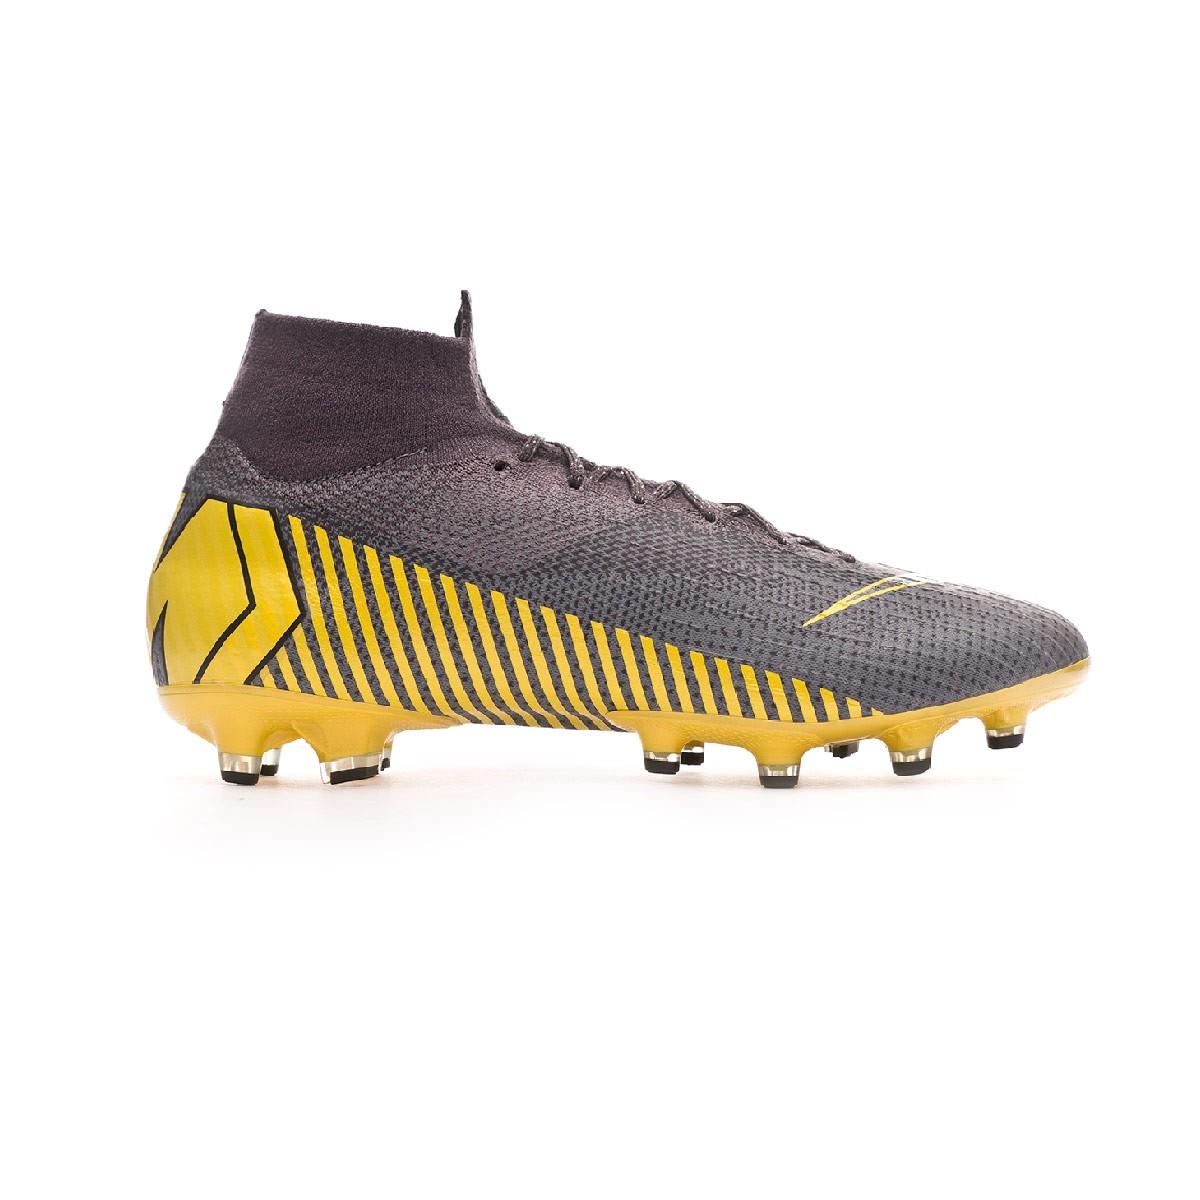 Vi Thunder De Nike Pro Mercurial Elite Bota Grey Ag Fútbol Superfly mNPyv8wOn0